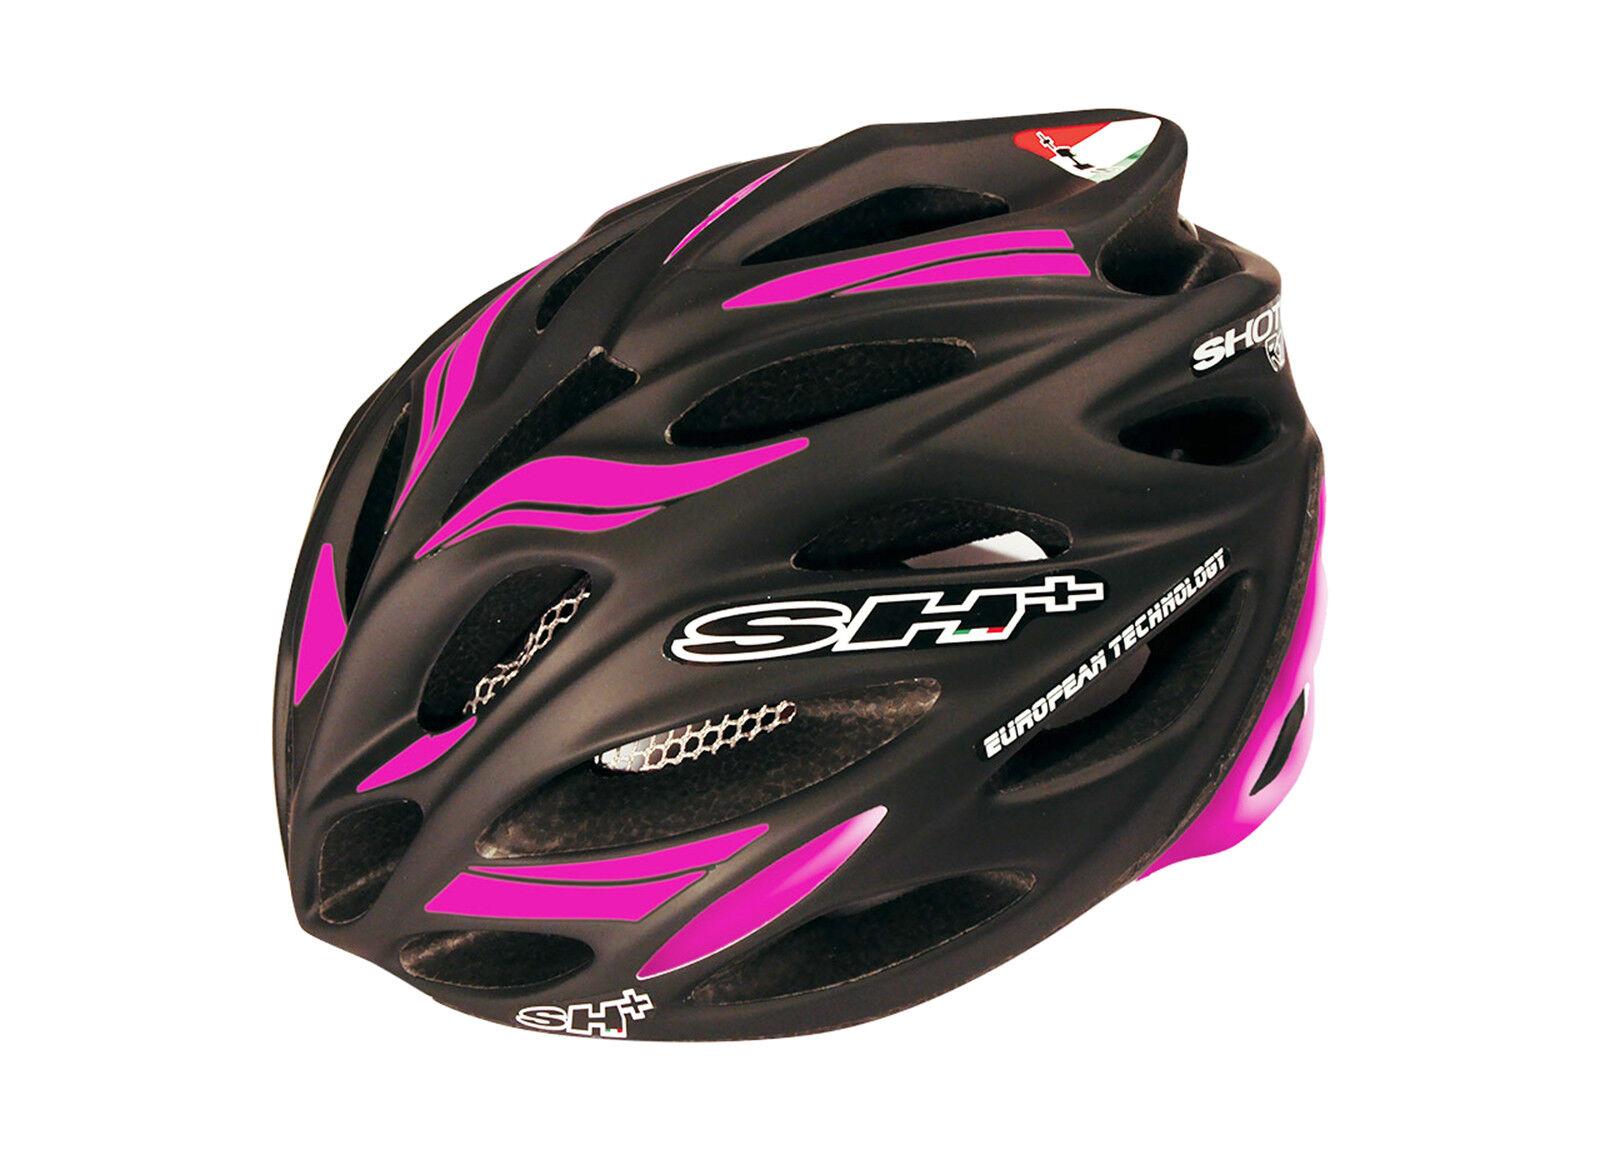 Casco  Sh+ Shot R1 profesional de Ciclismo Cochebono Fluor Negro y Fucsia  6085nfuc  para mayoristas